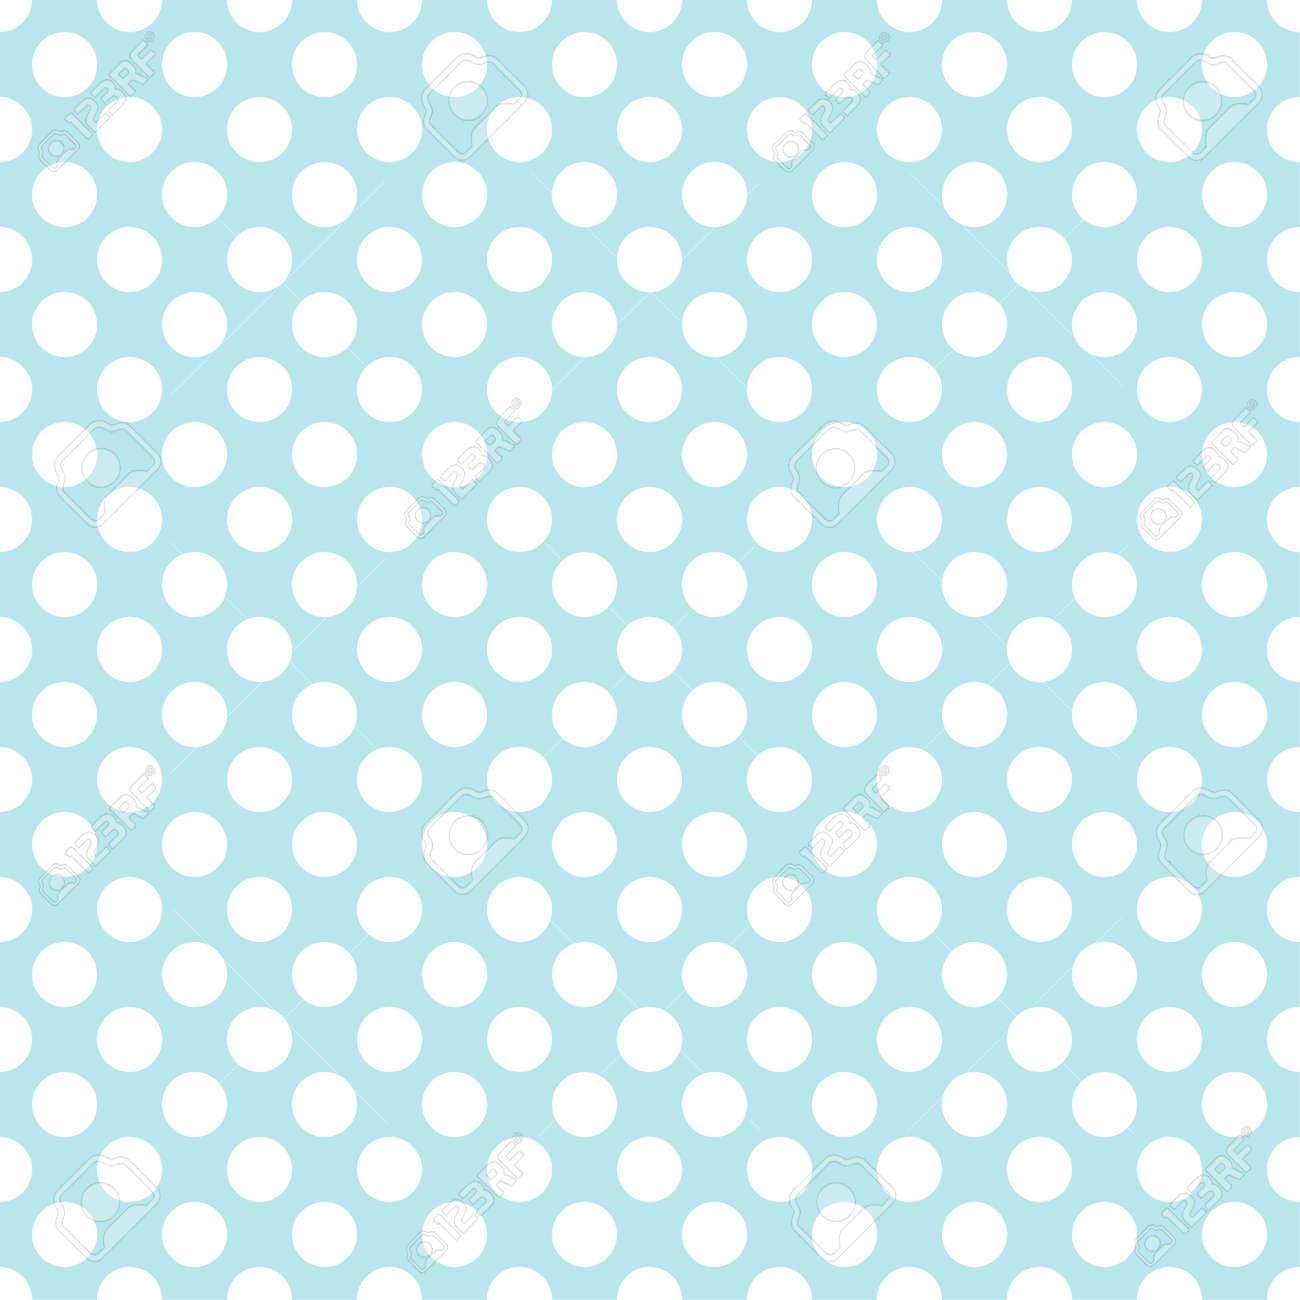 Blue Polka Dot Background Seamless Pattern Vector Royalty Free